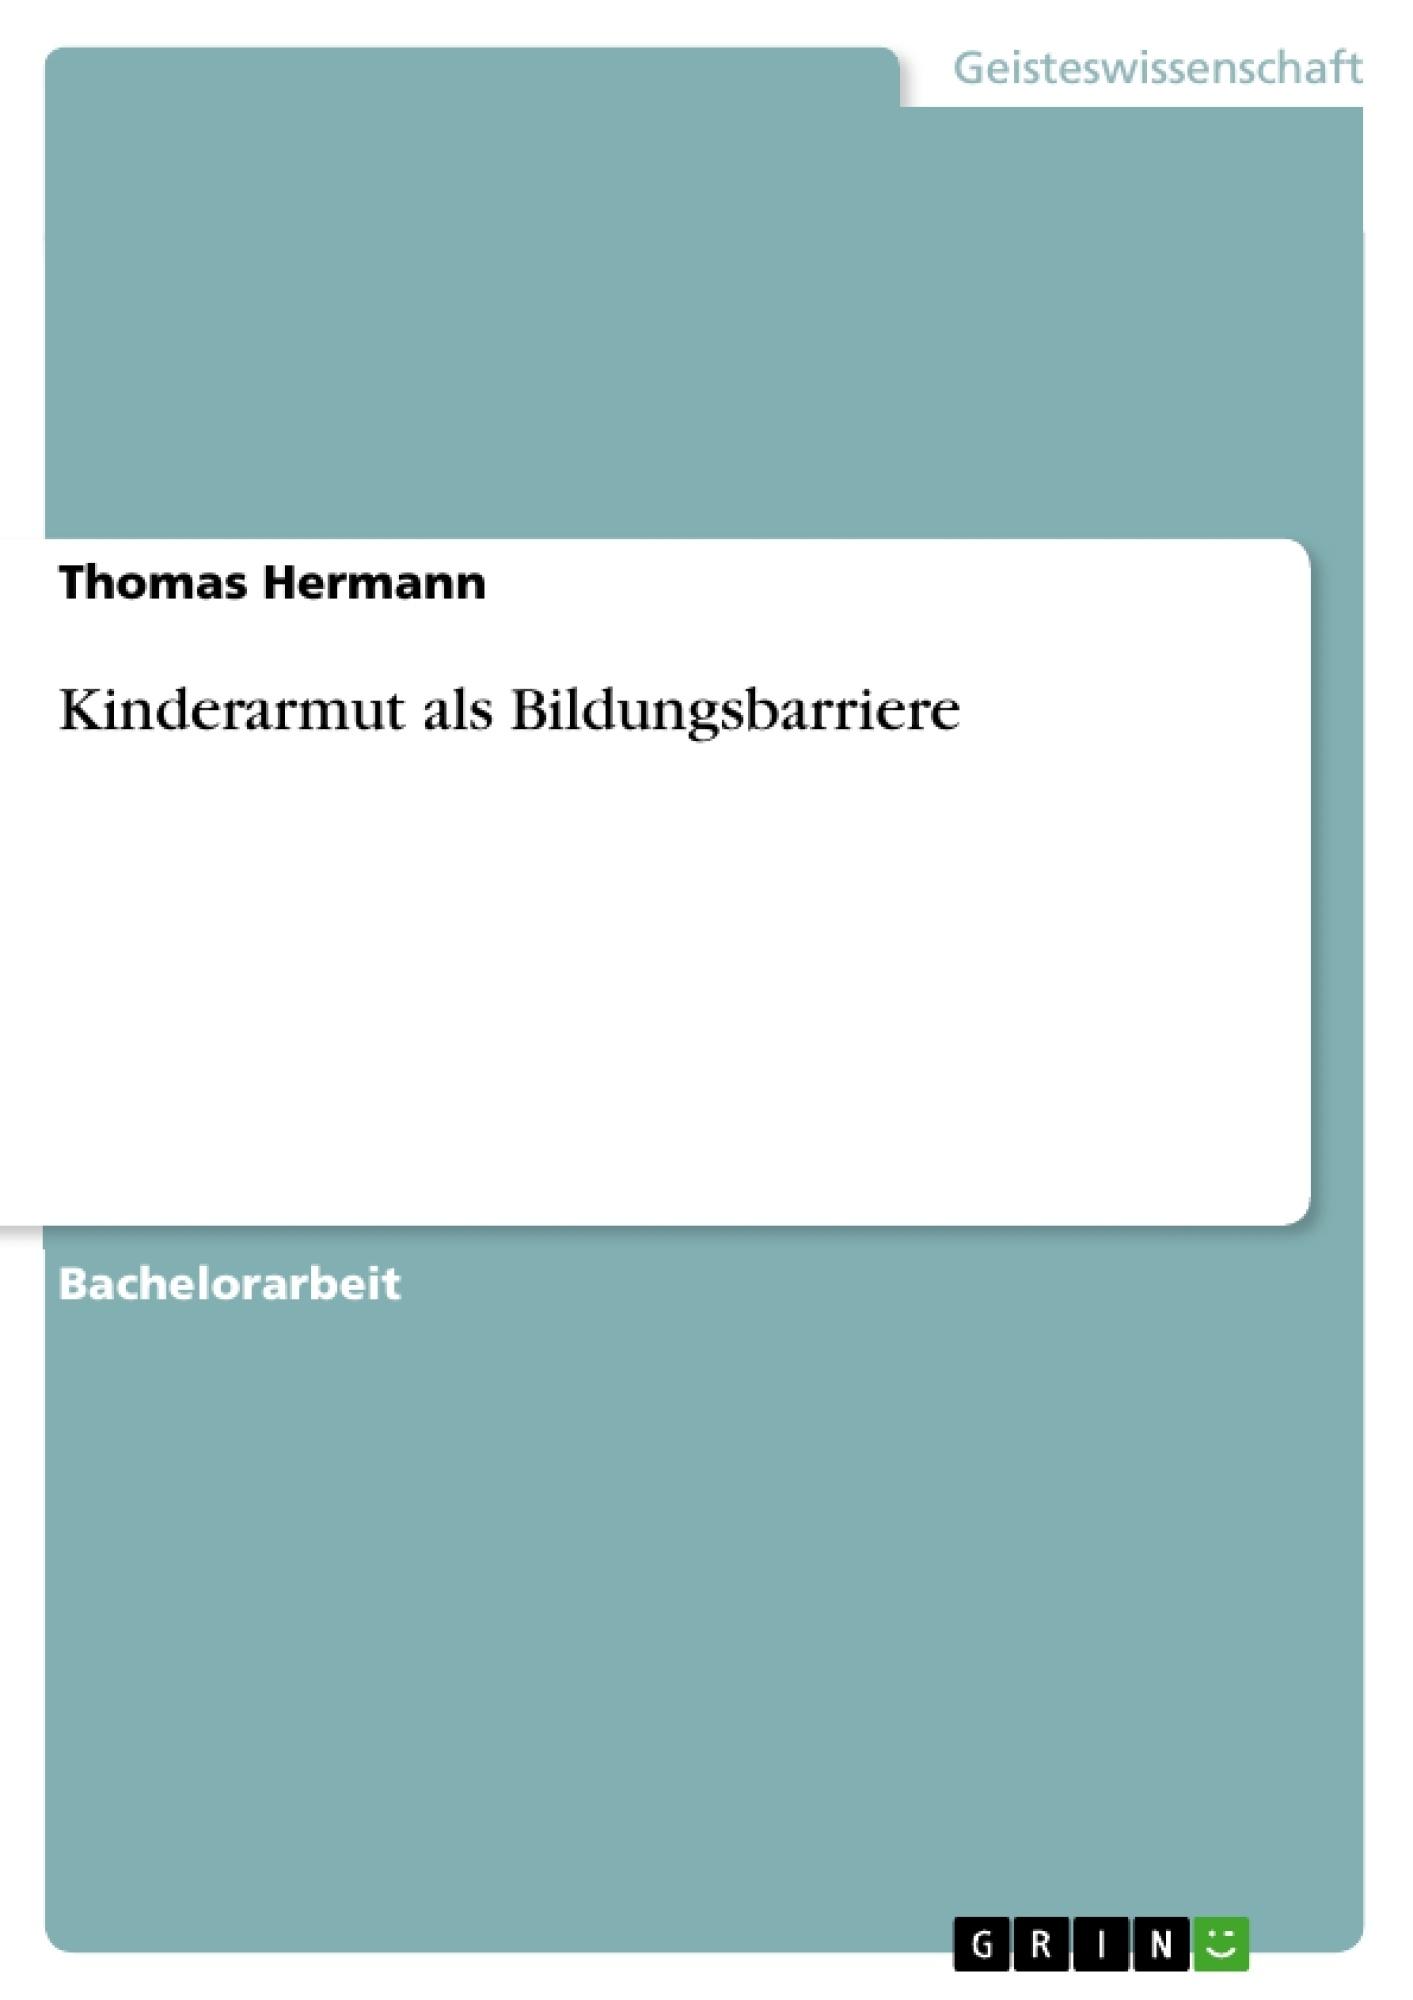 Titel: Kinderarmut als Bildungsbarriere